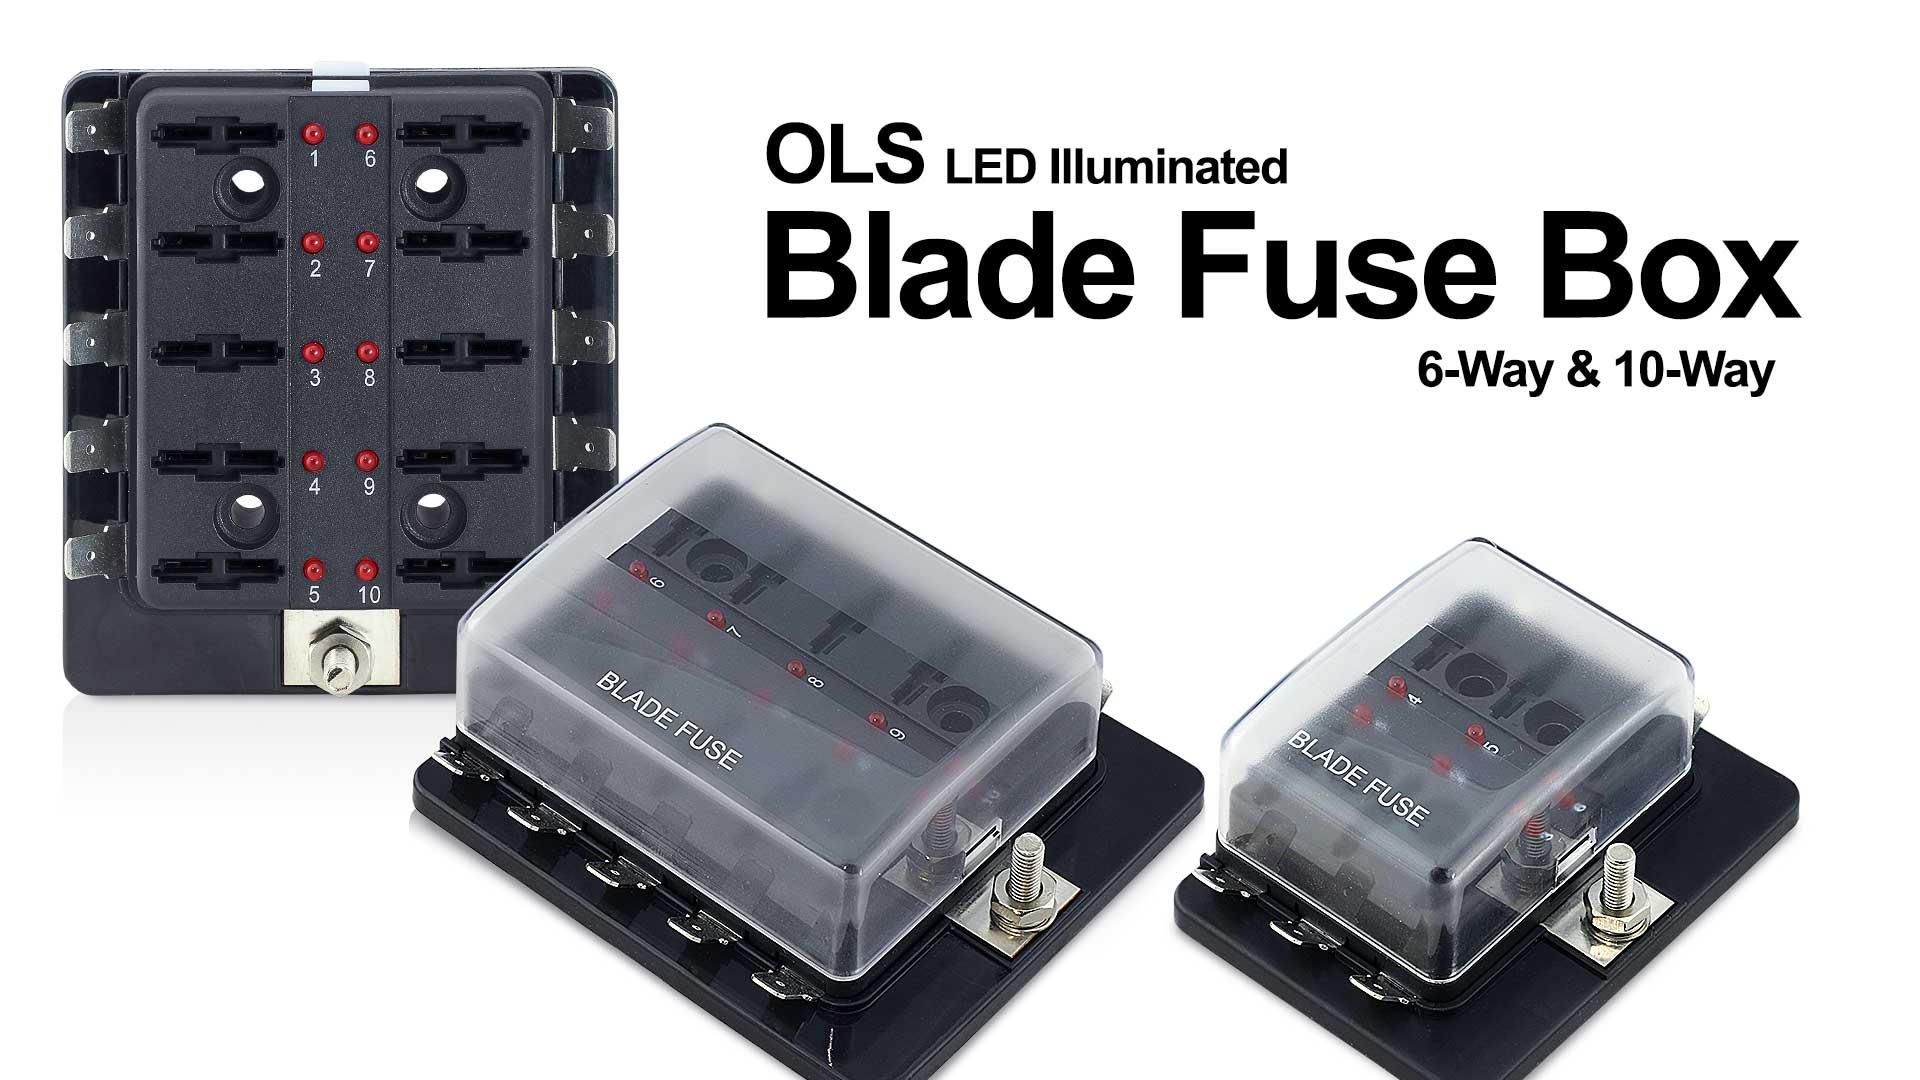 834080fa20fd5caa05a23734a694817ff20e95f7?image_crop_resized=640x360 6 way fuse box fuse for led lights led fuse box waterproof fuse box at n-0.co